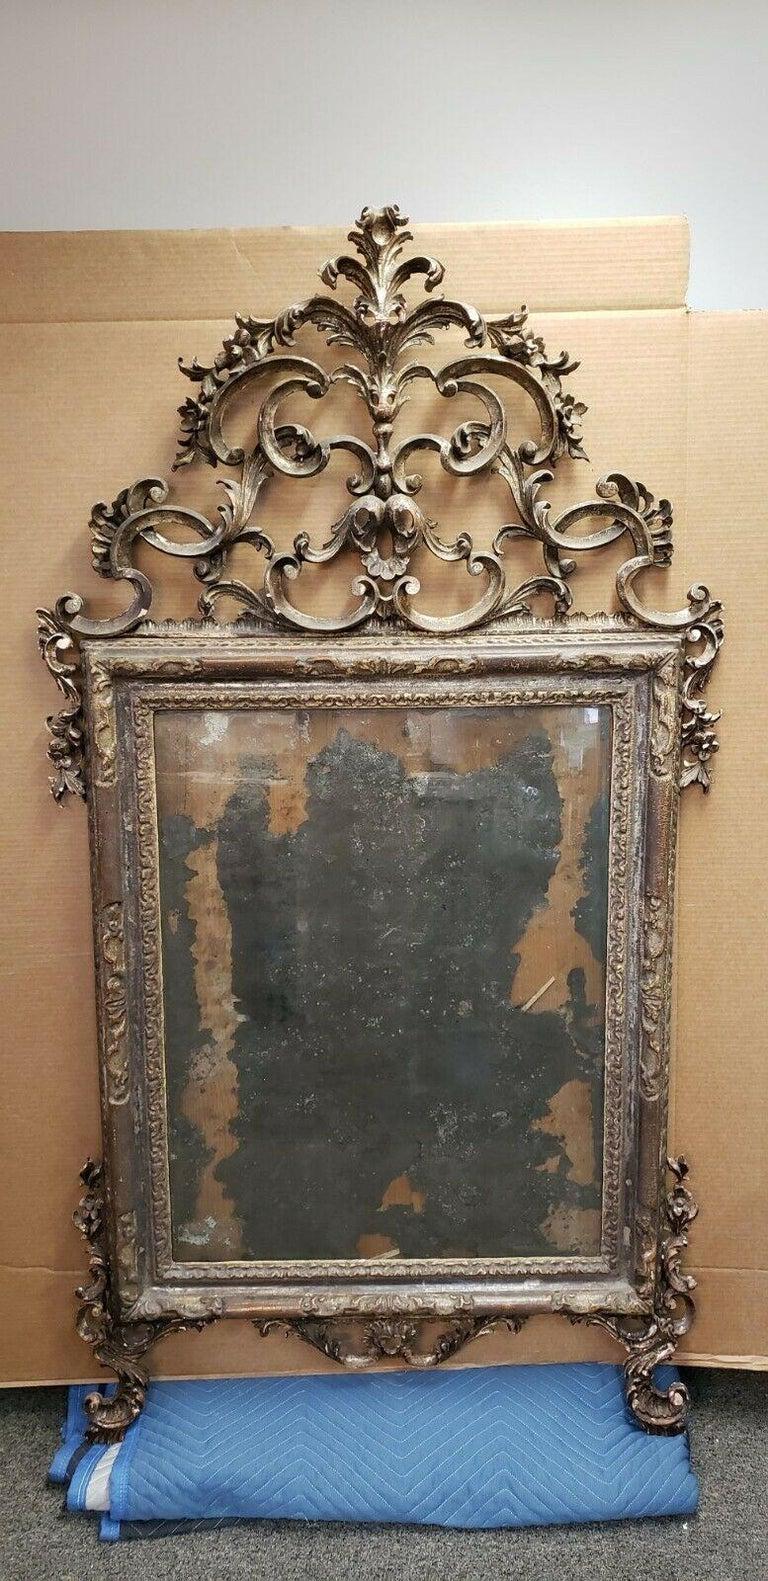 Giltwood 18th Century Italian Rococo Silver Gilt Mirror For Sale